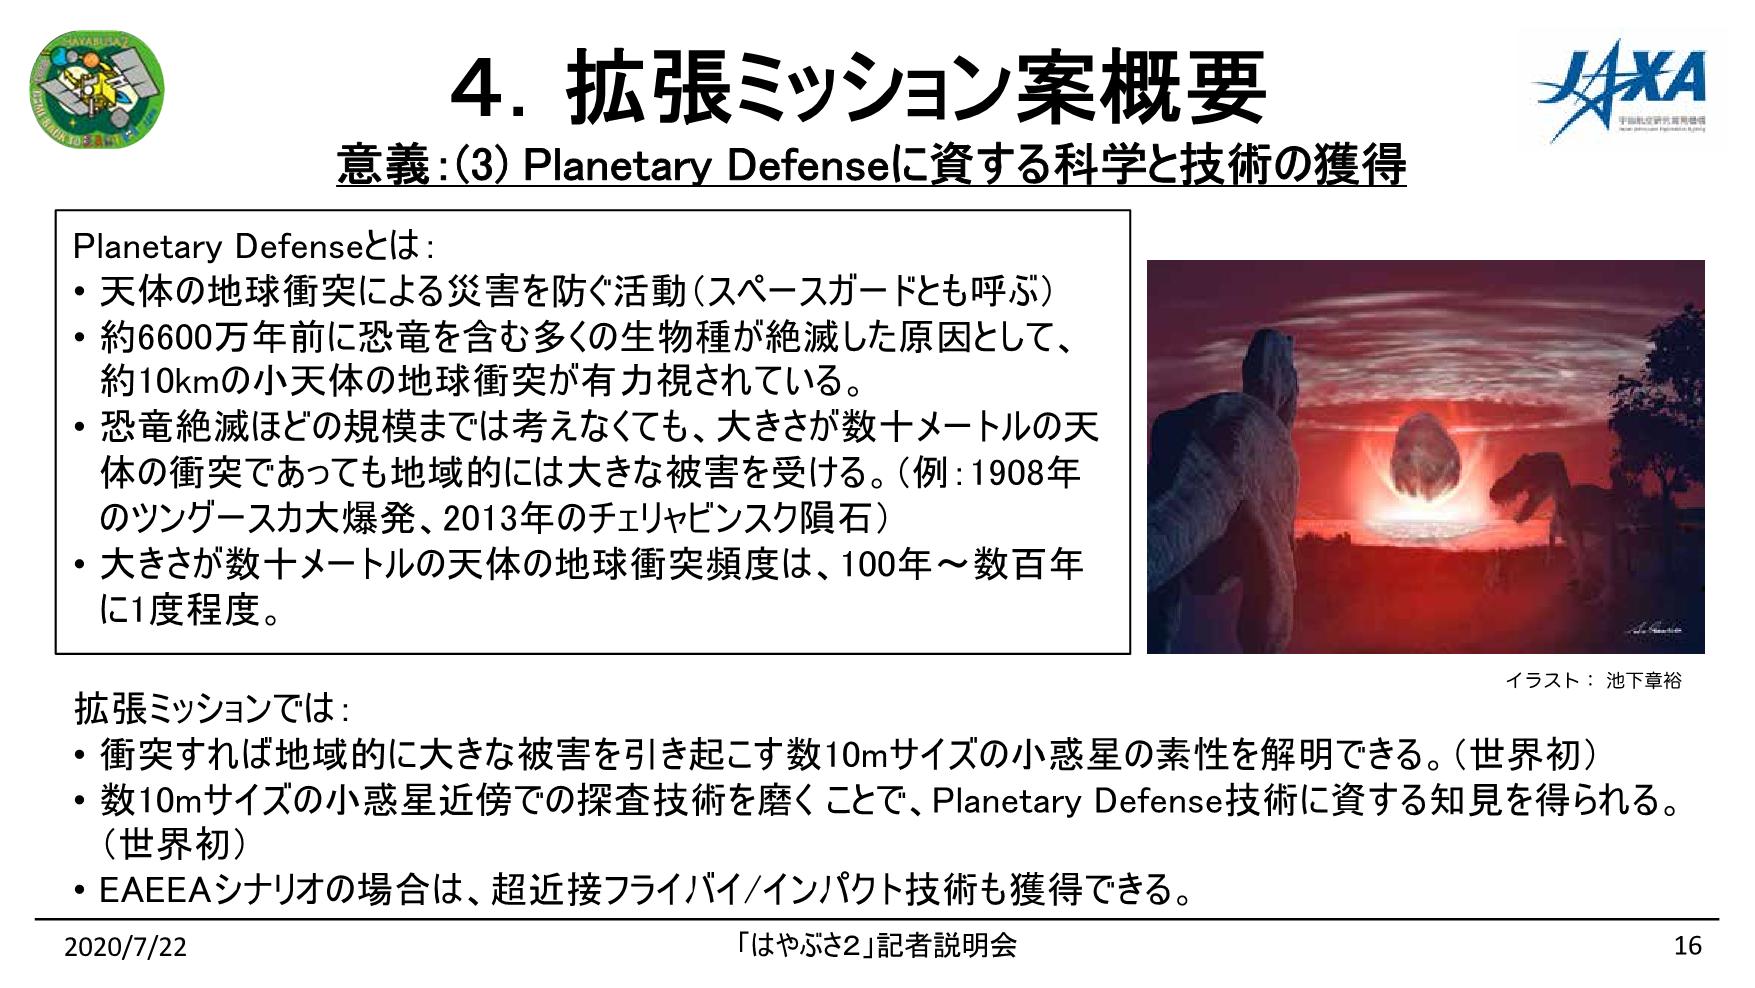 f:id:Imamura:20200722140745p:plain